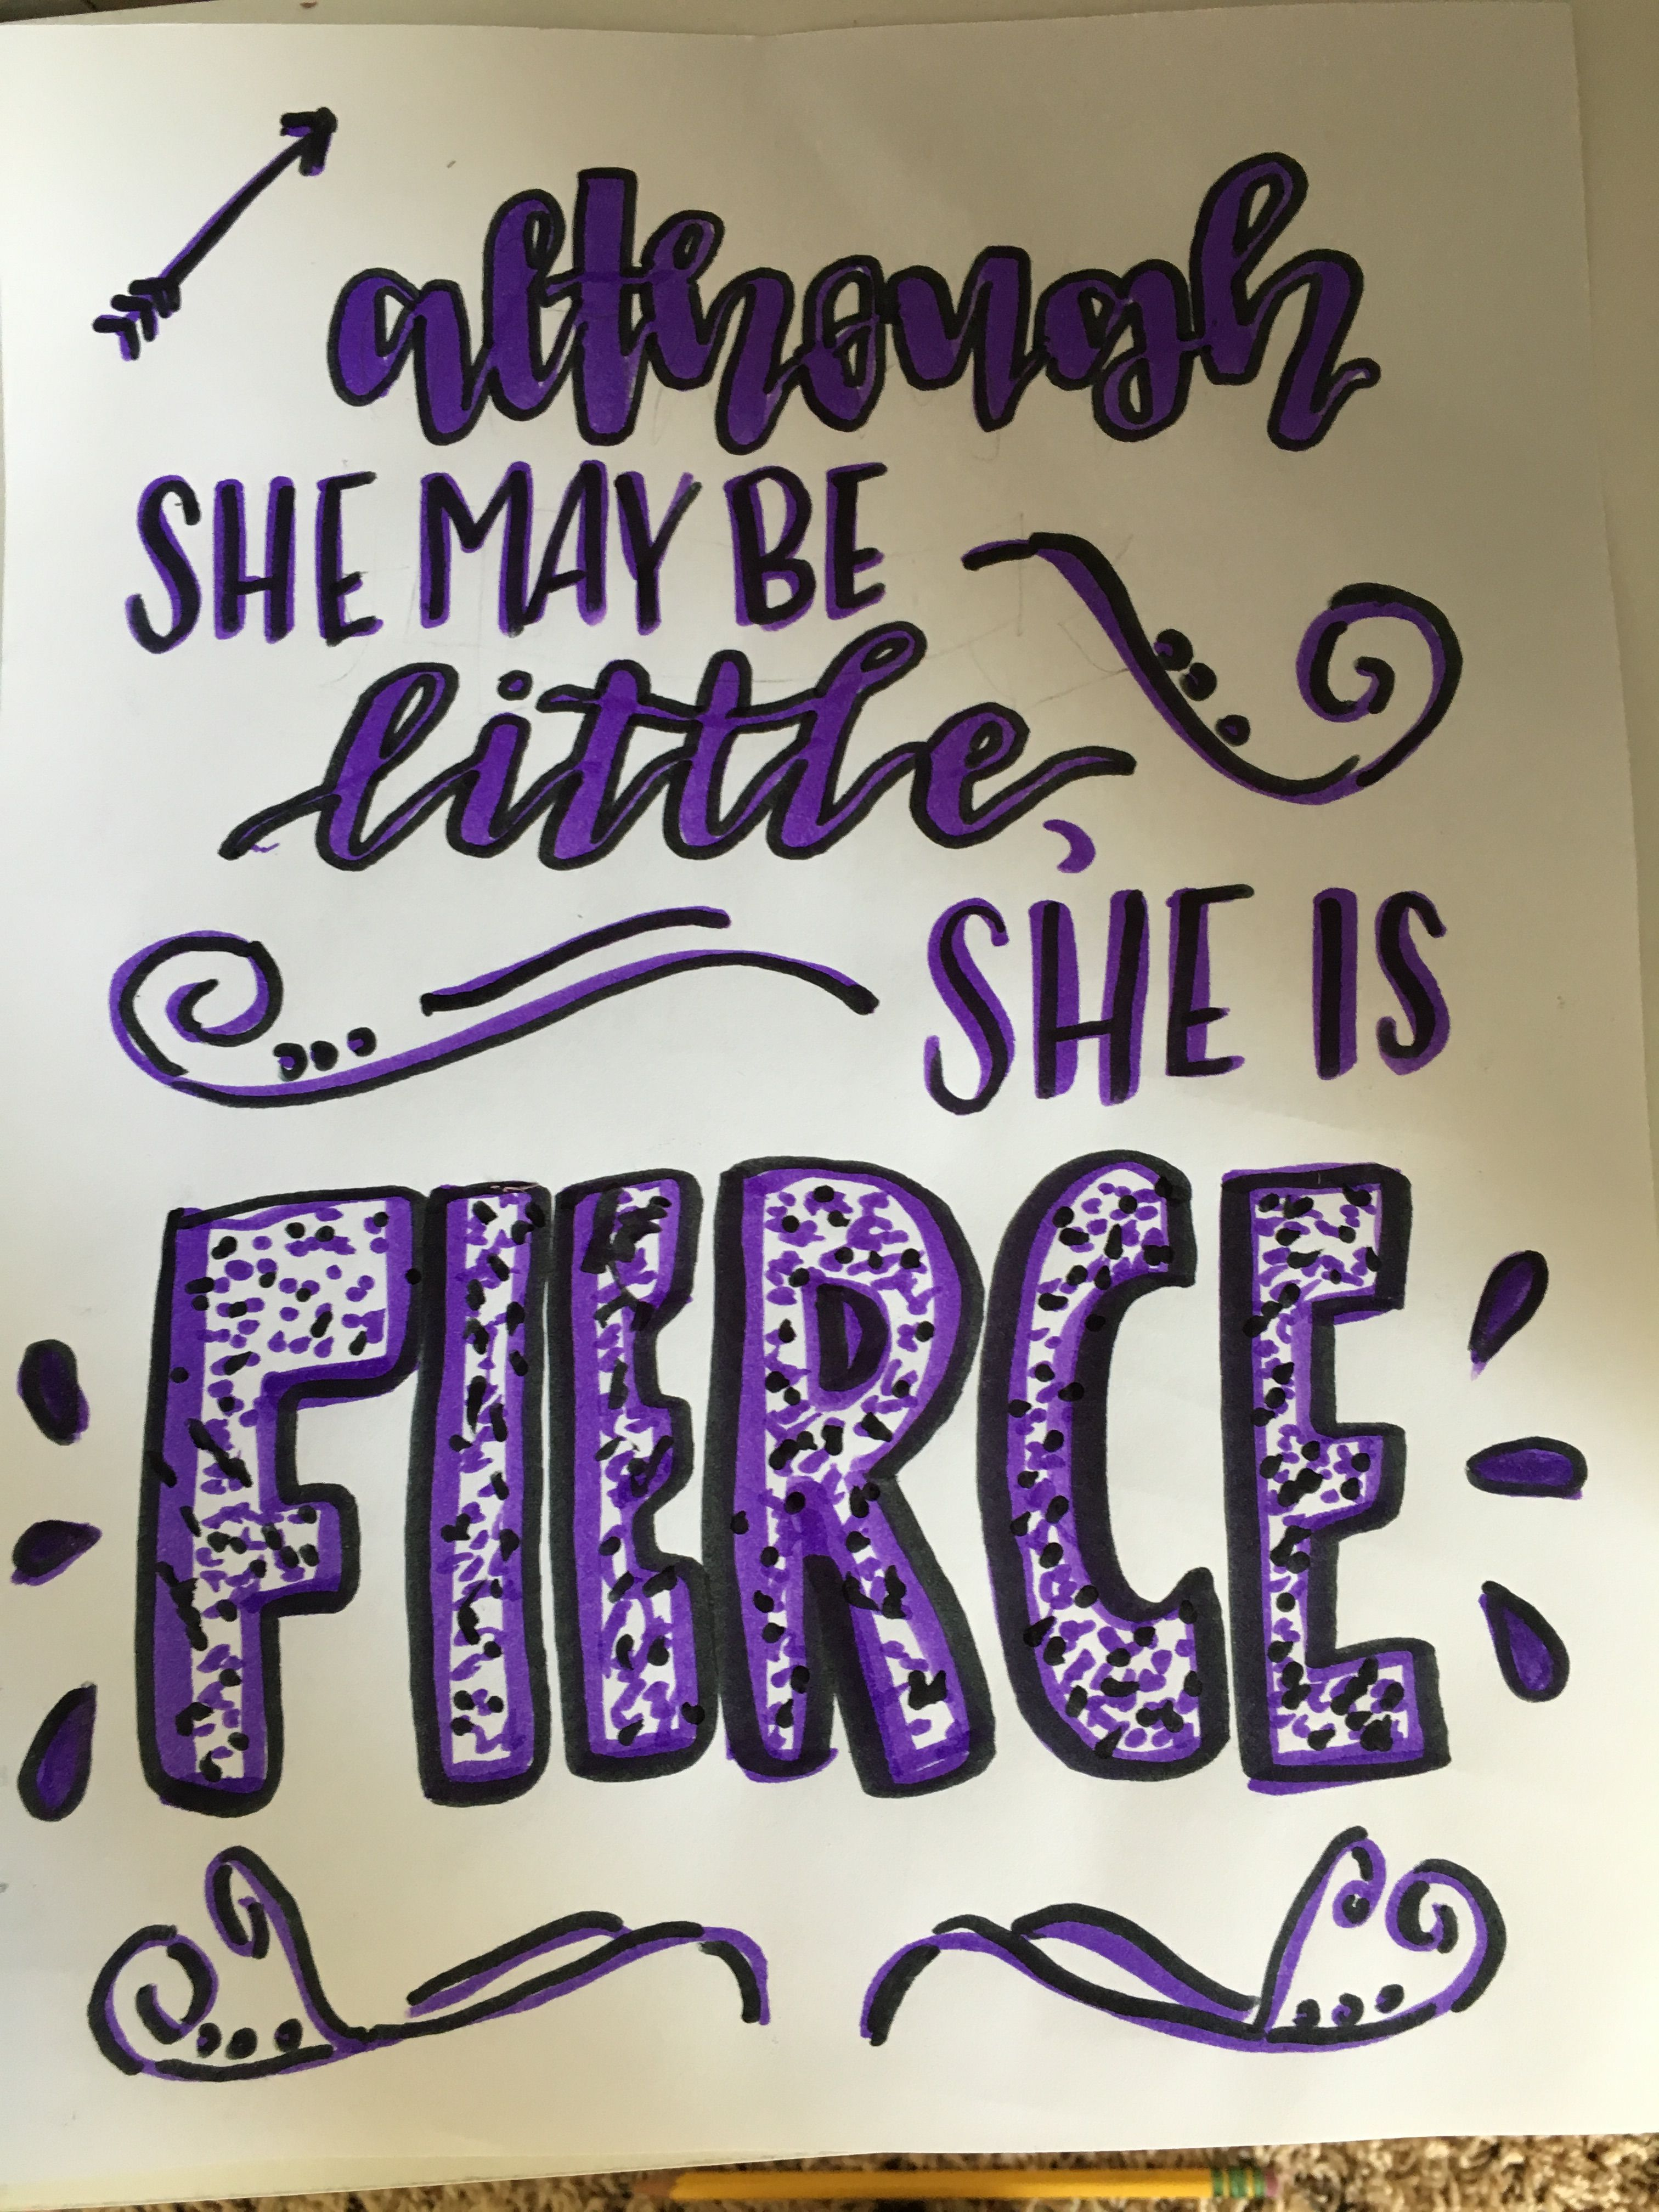 Pin By Jada Dotting On Tumblr Drawings Hand Lettering Quotes Lettering Quotes Handwritten Quotes